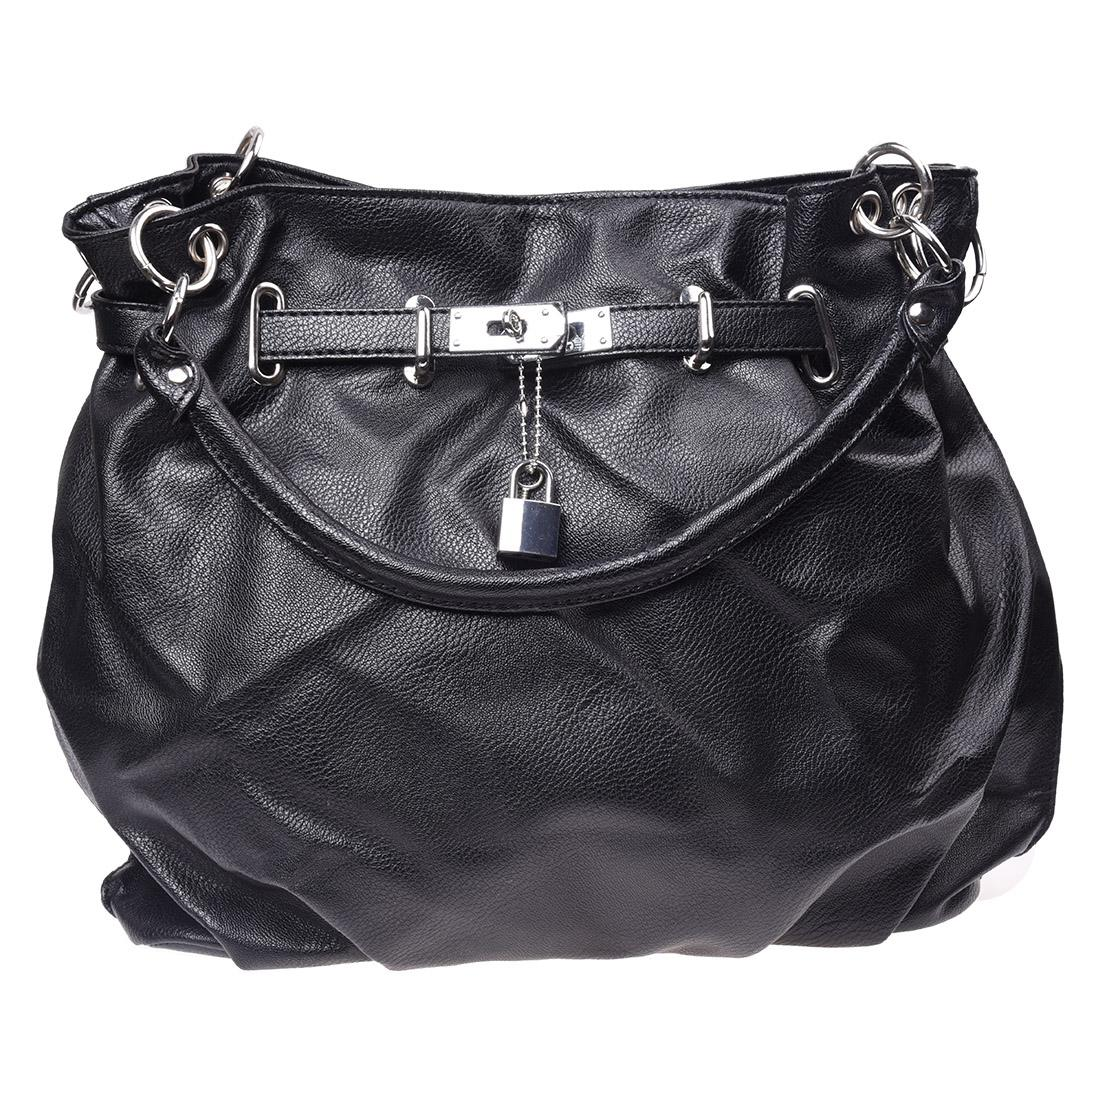 5 X SNNY Girls PU Leather Hobo Handbag Bag Tote Shoulder Cross Body Black фикситека электричество региональное издание dvd